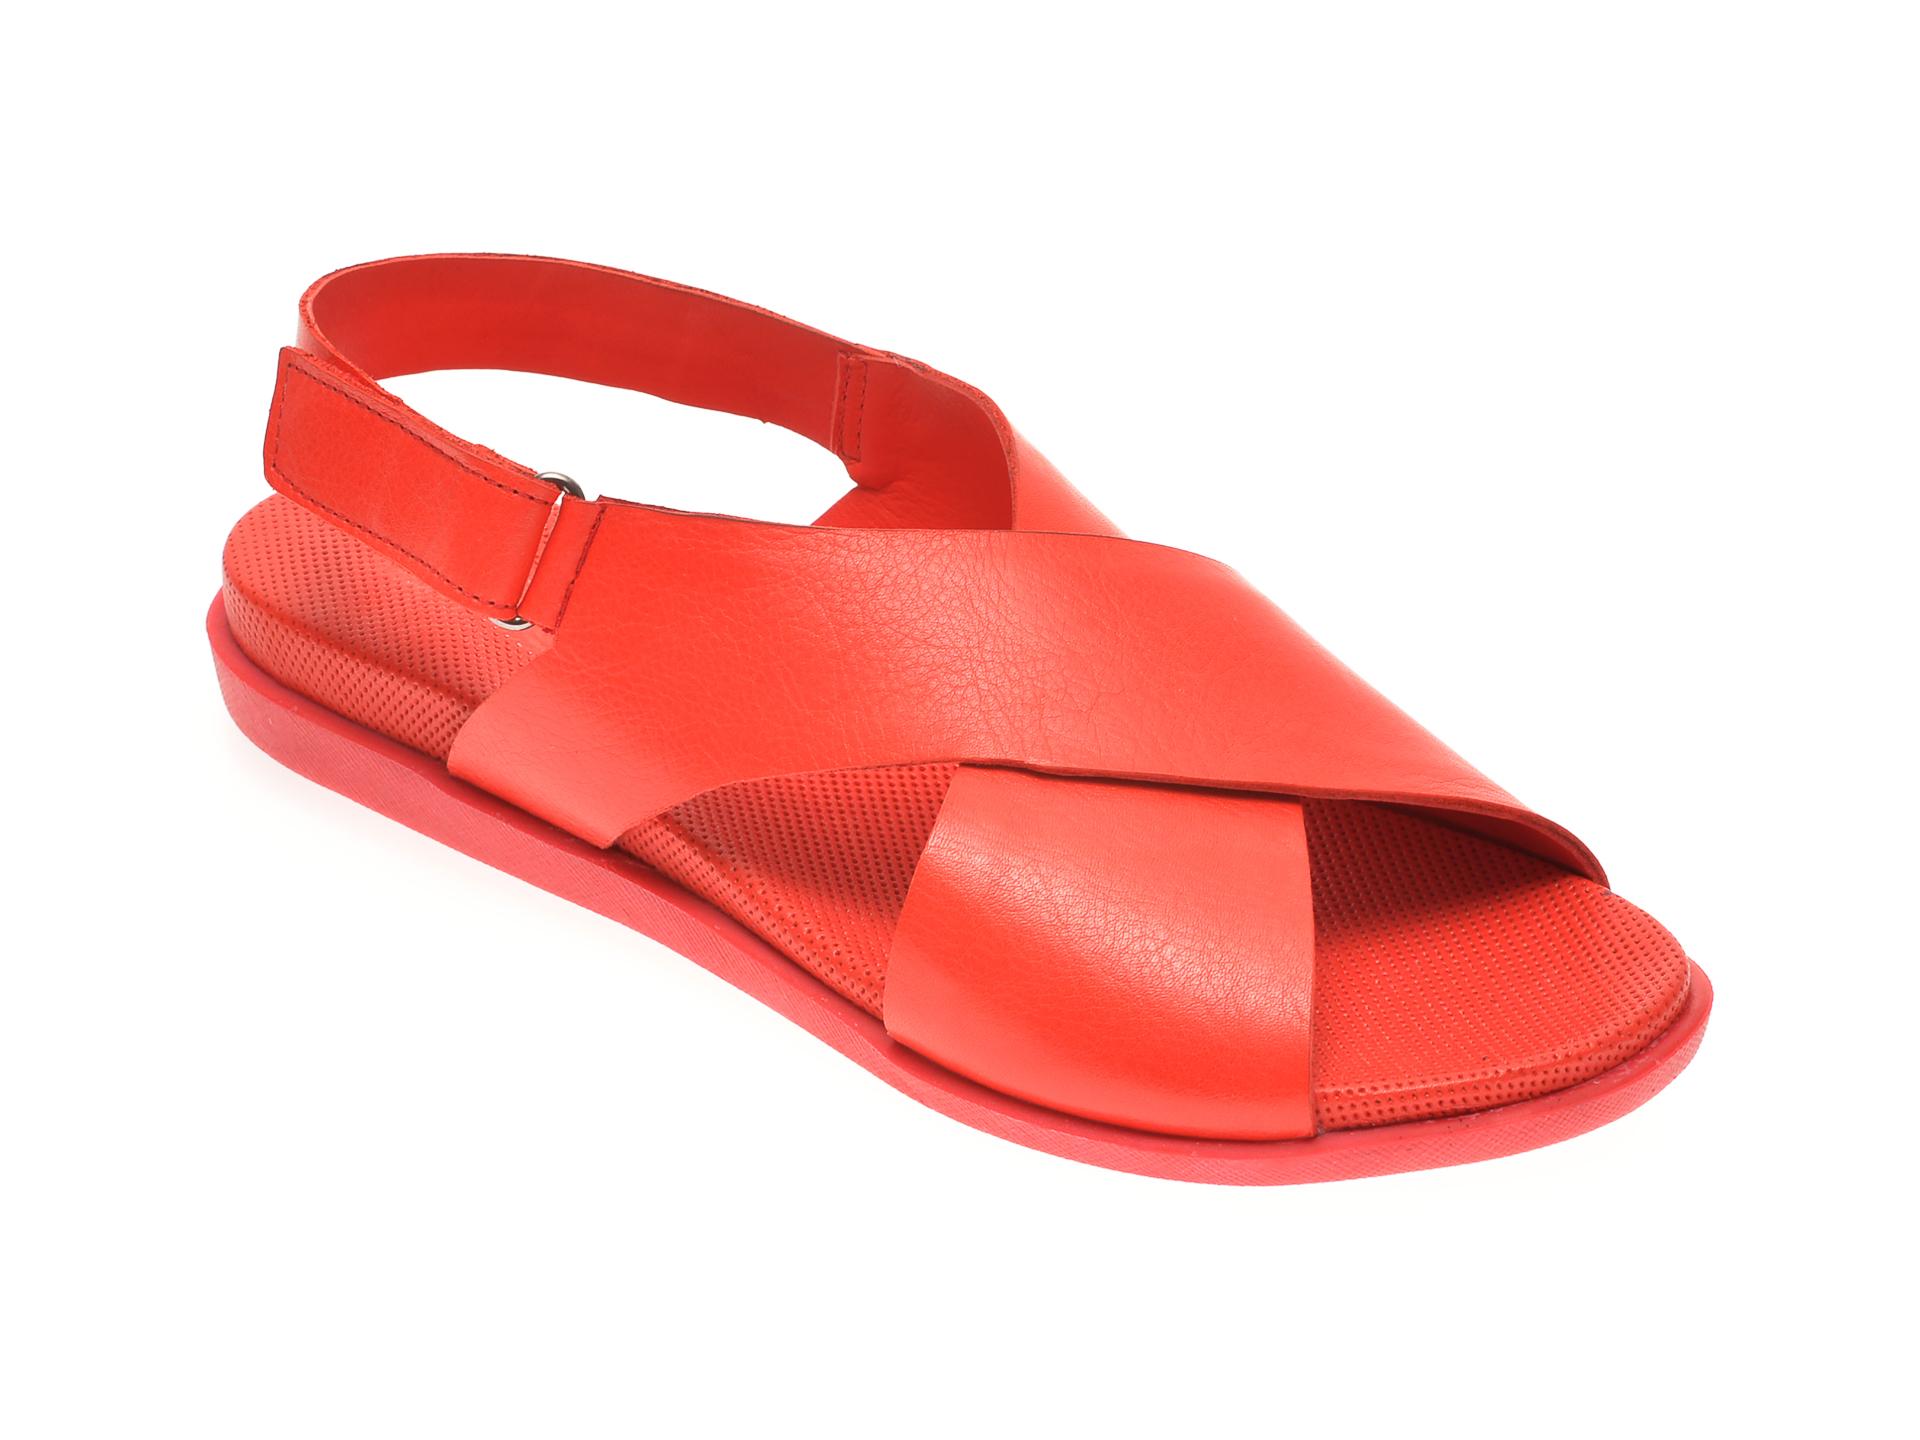 Sandale BABOOS rosii, 1401, din piele naturala imagine